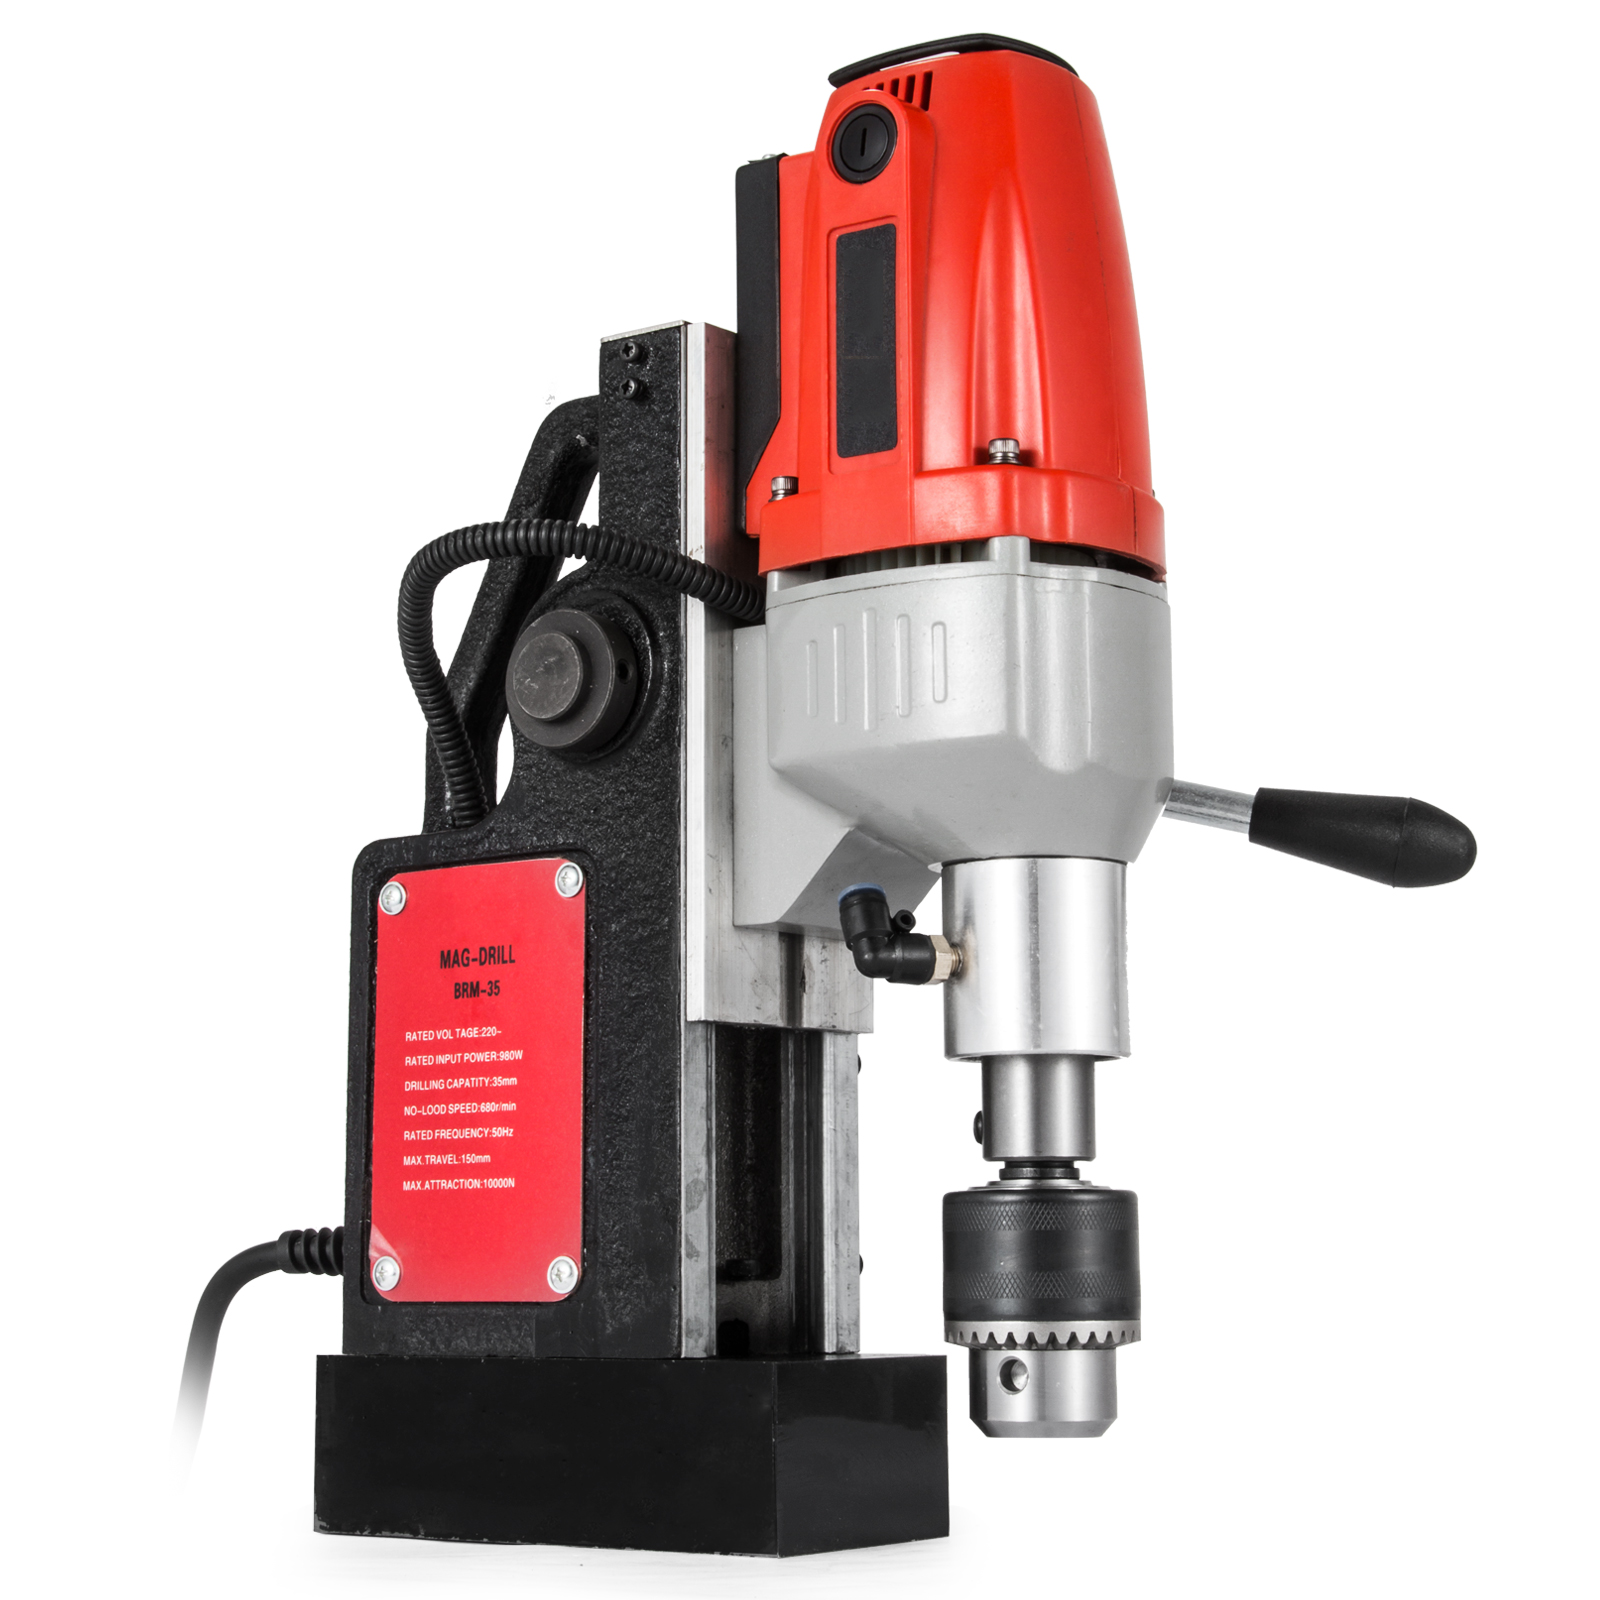 MB23-BRM35-MD40-Trapano-Perforatrice-Carotatore-Fresa-Magnetico-12-40mm-230V miniatura 68